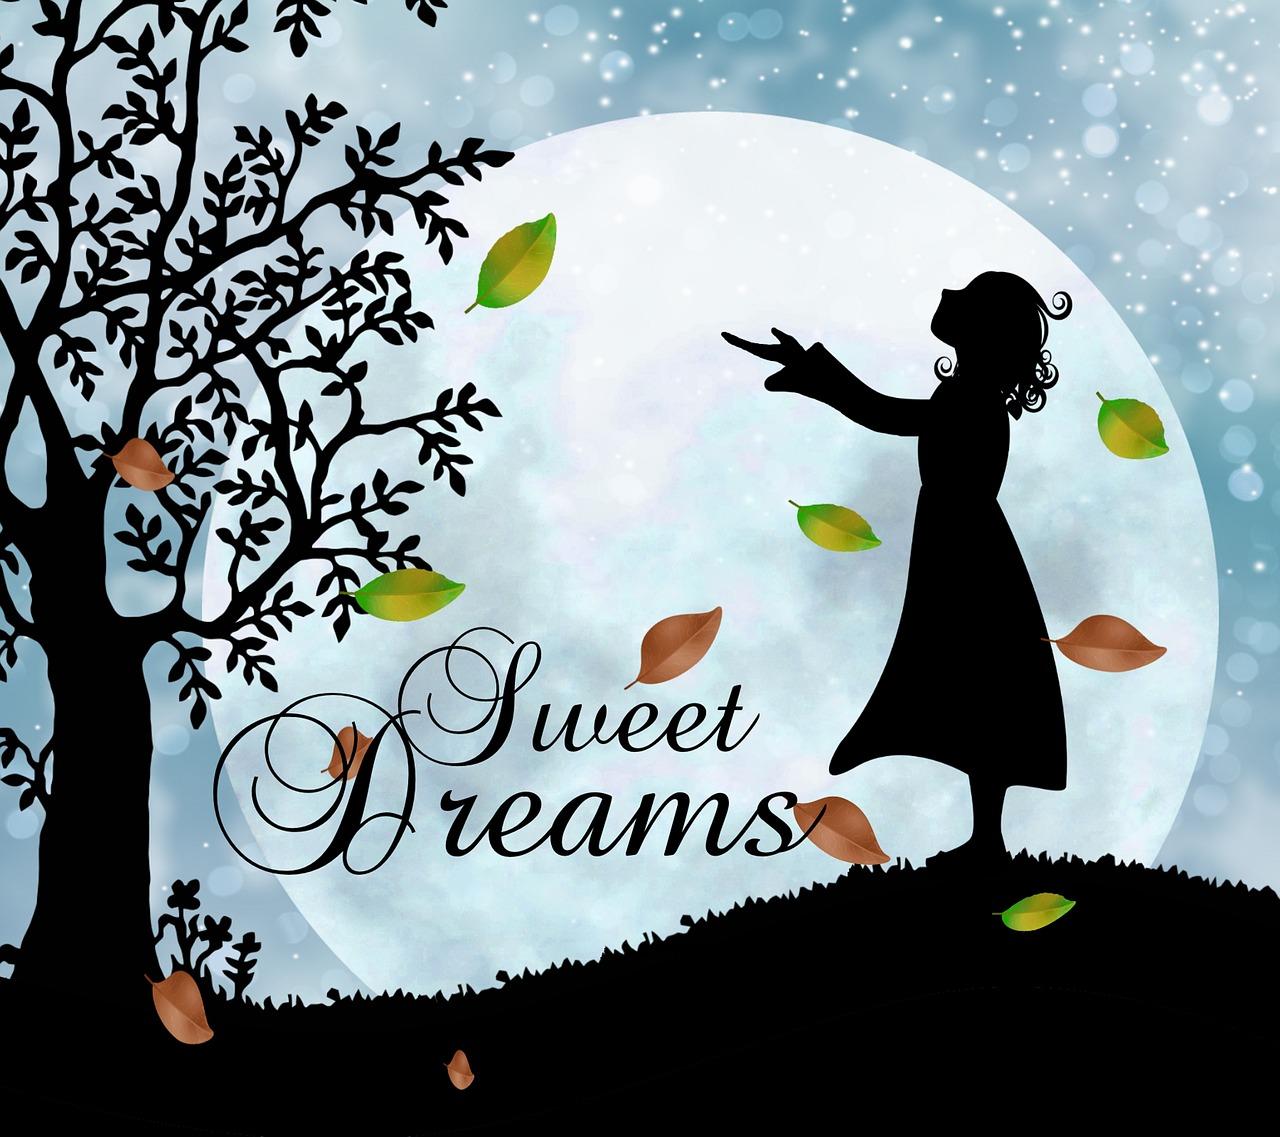 Good night photos || Good night photos hd || Good night photos download || Good night hd photos